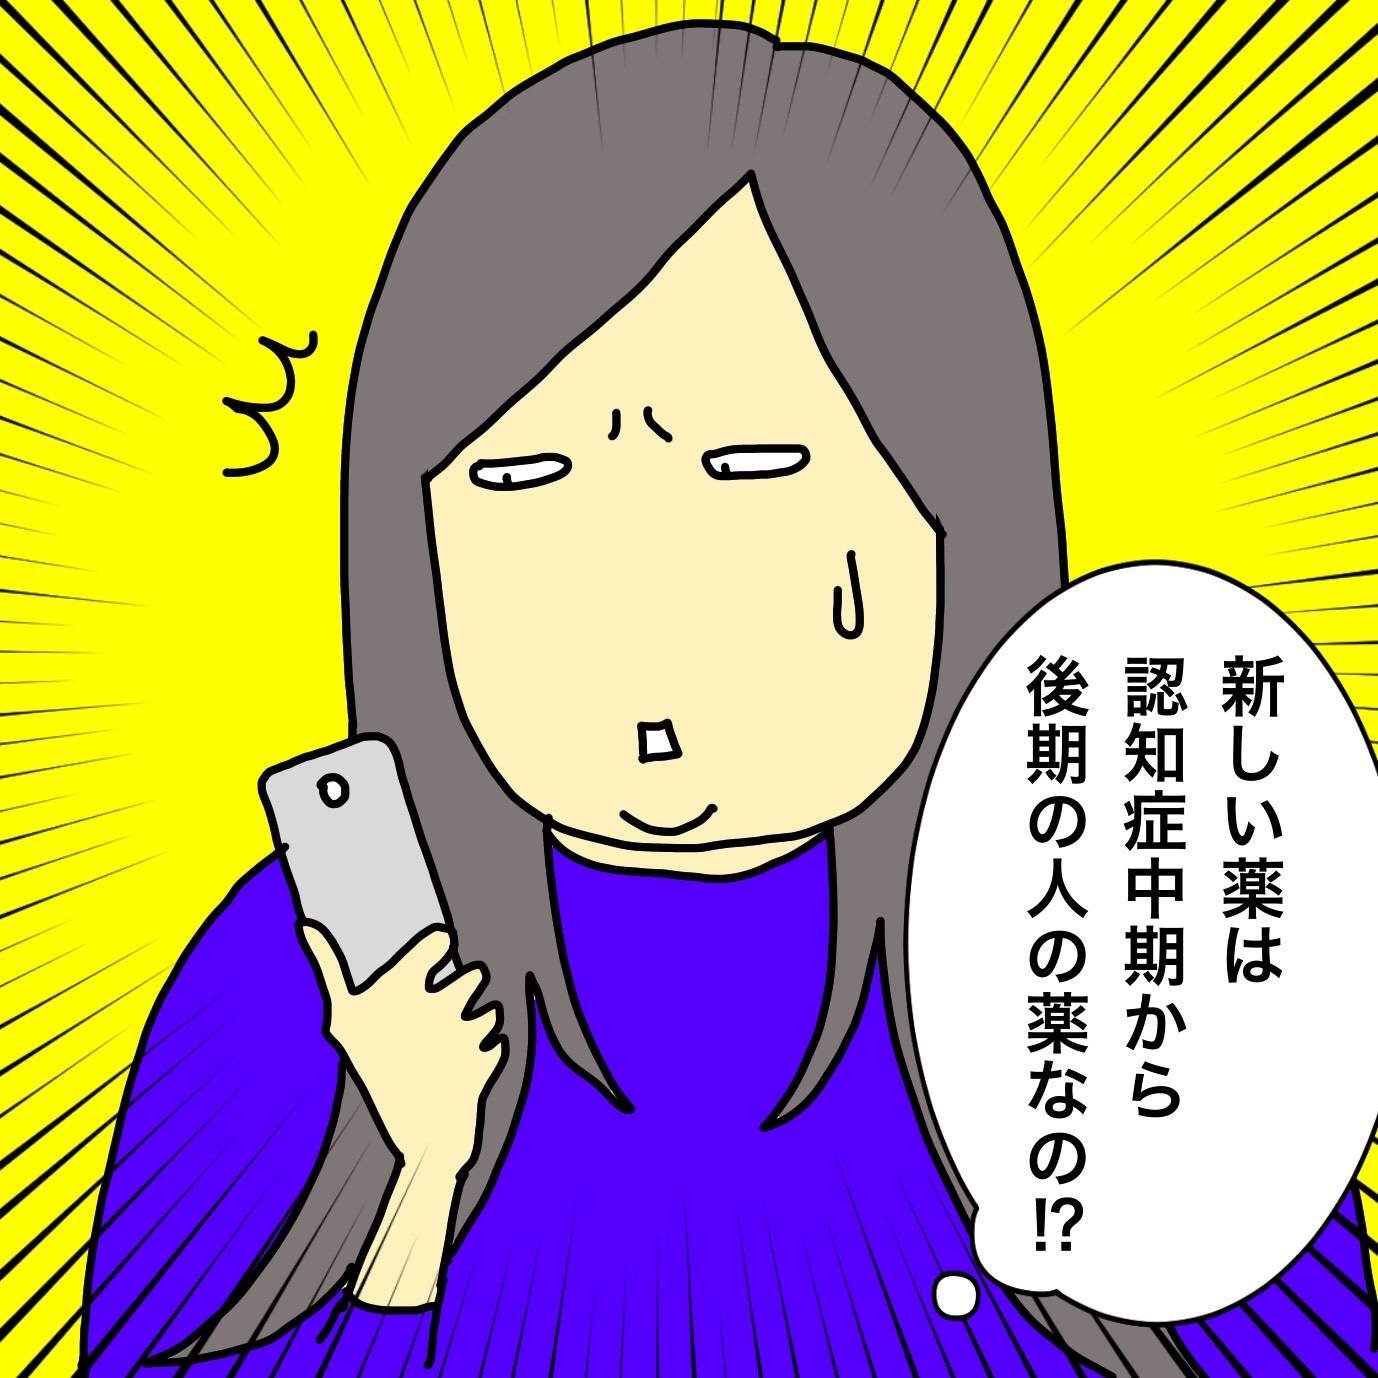 Image-18.jpeg